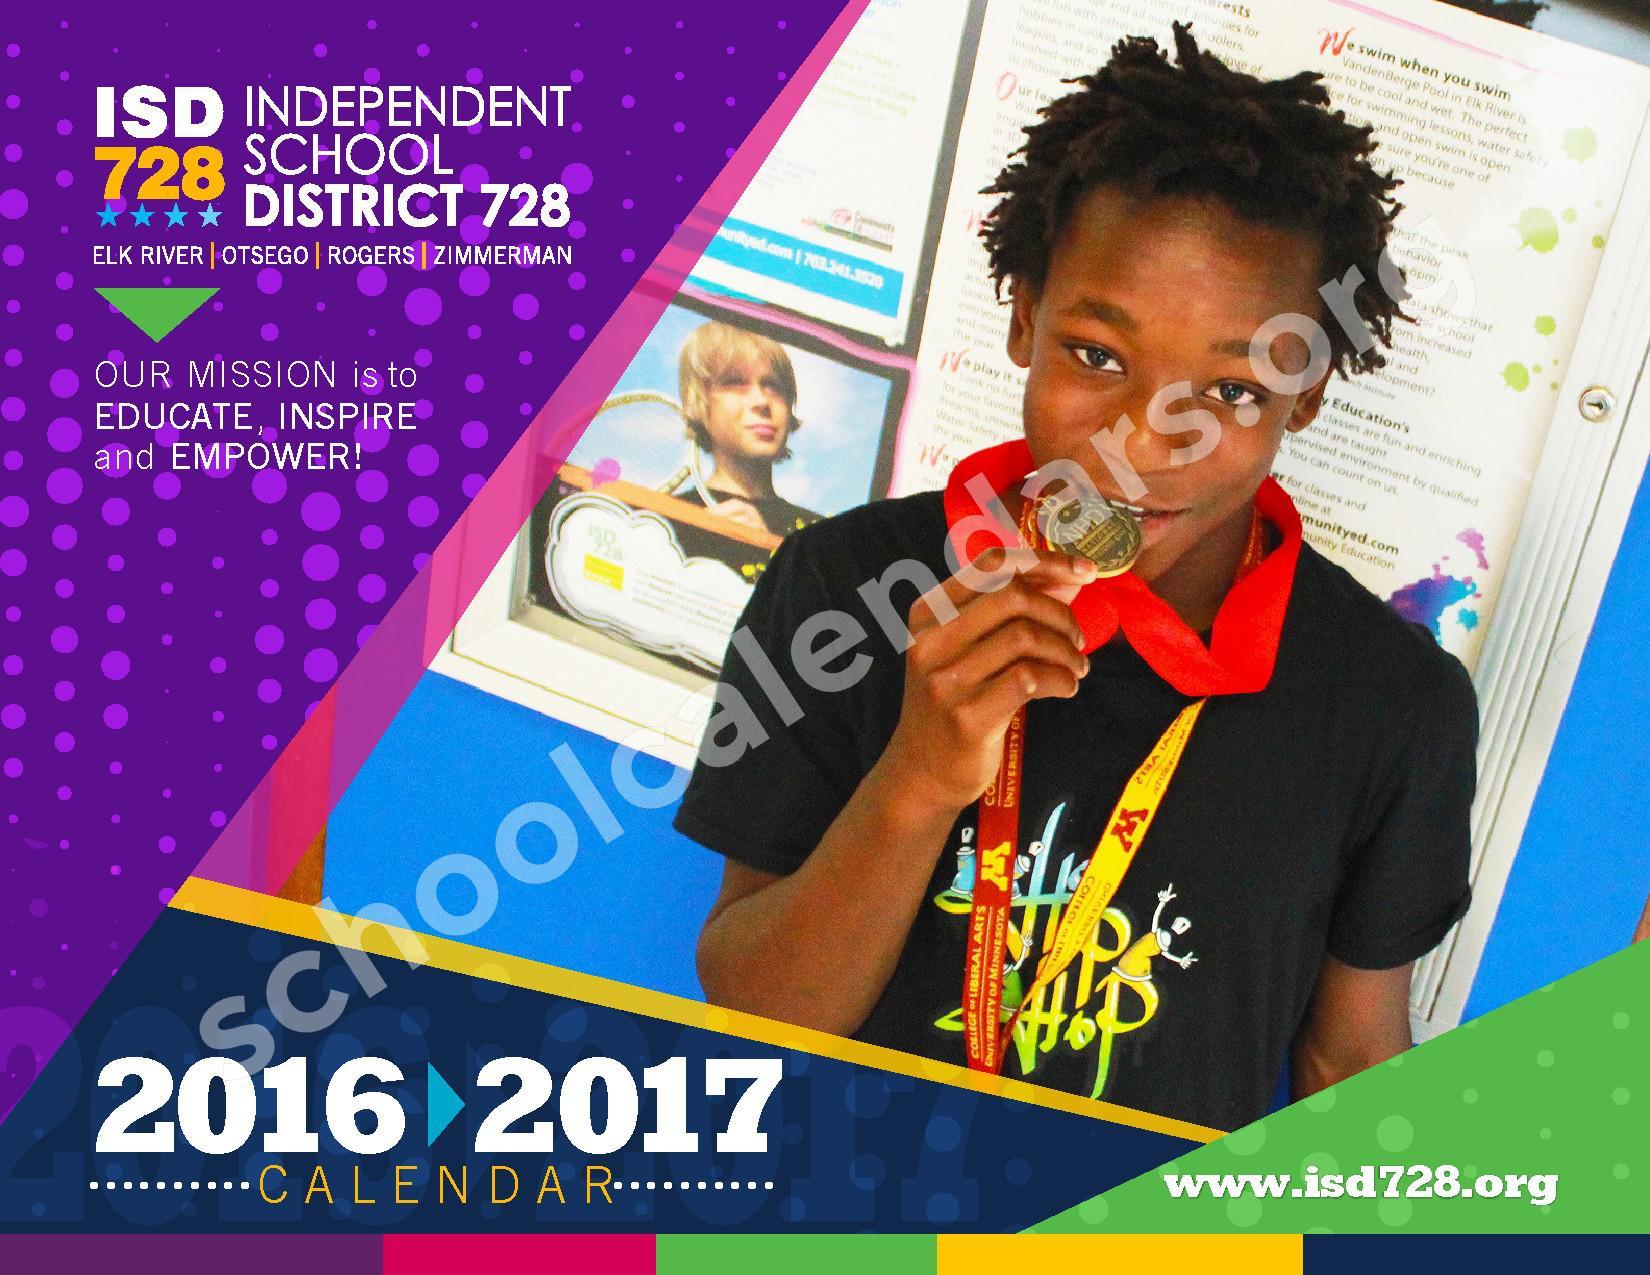 2016 - 2017 District Calendar – Vandenberge Middle School – page 1